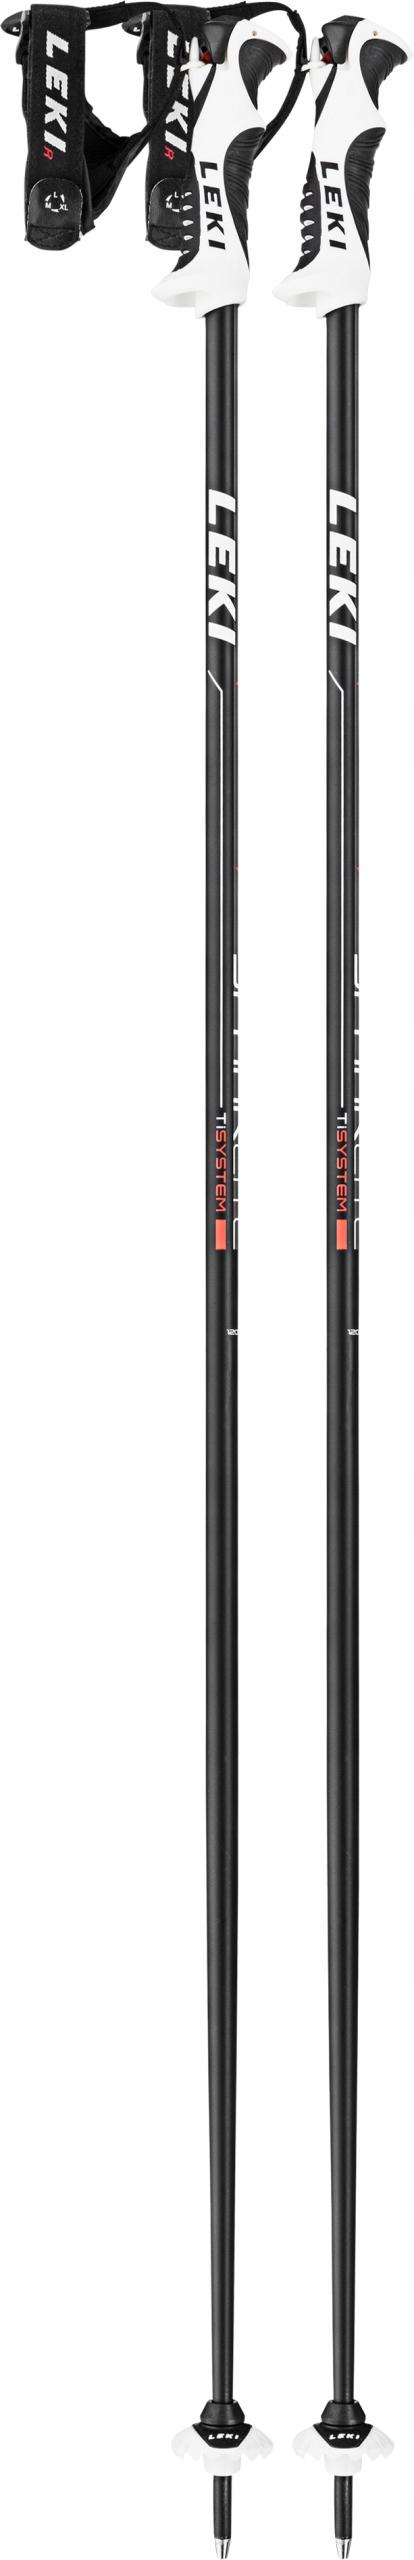 DROGY Lite ISKRA S lyžiarske palice lyžiarske 130 cm